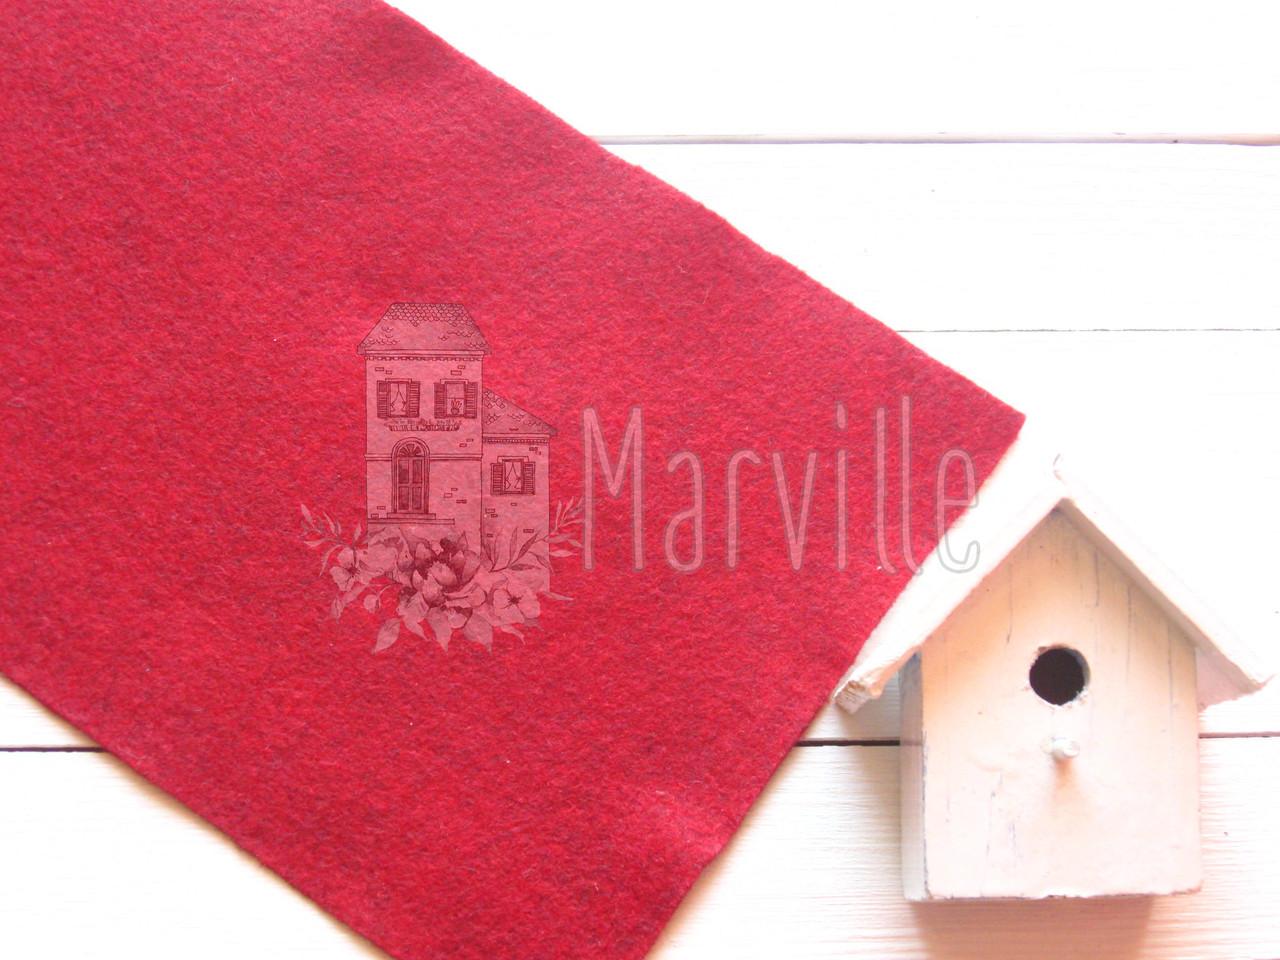 Фетр американский мягкий  Багровый (2205 Barnyard Red)